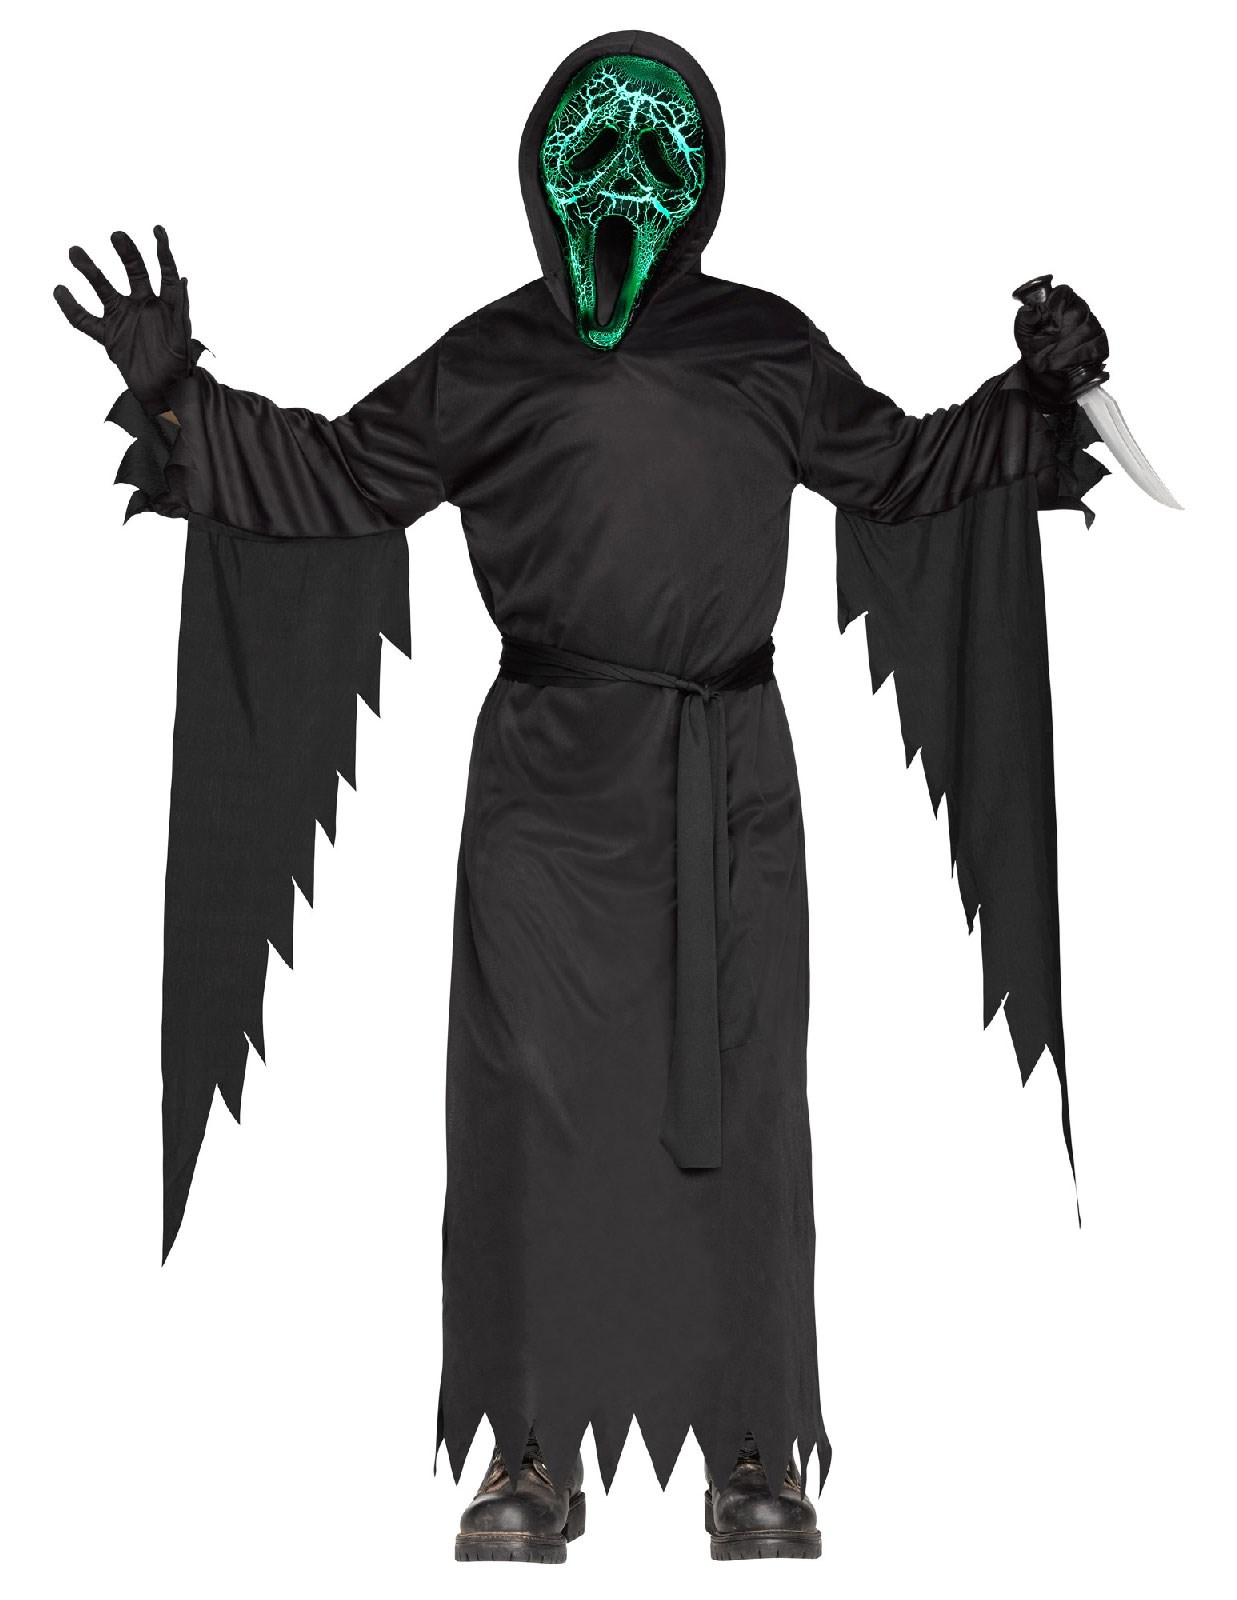 Smoldering Ghost Face Costume For Kids